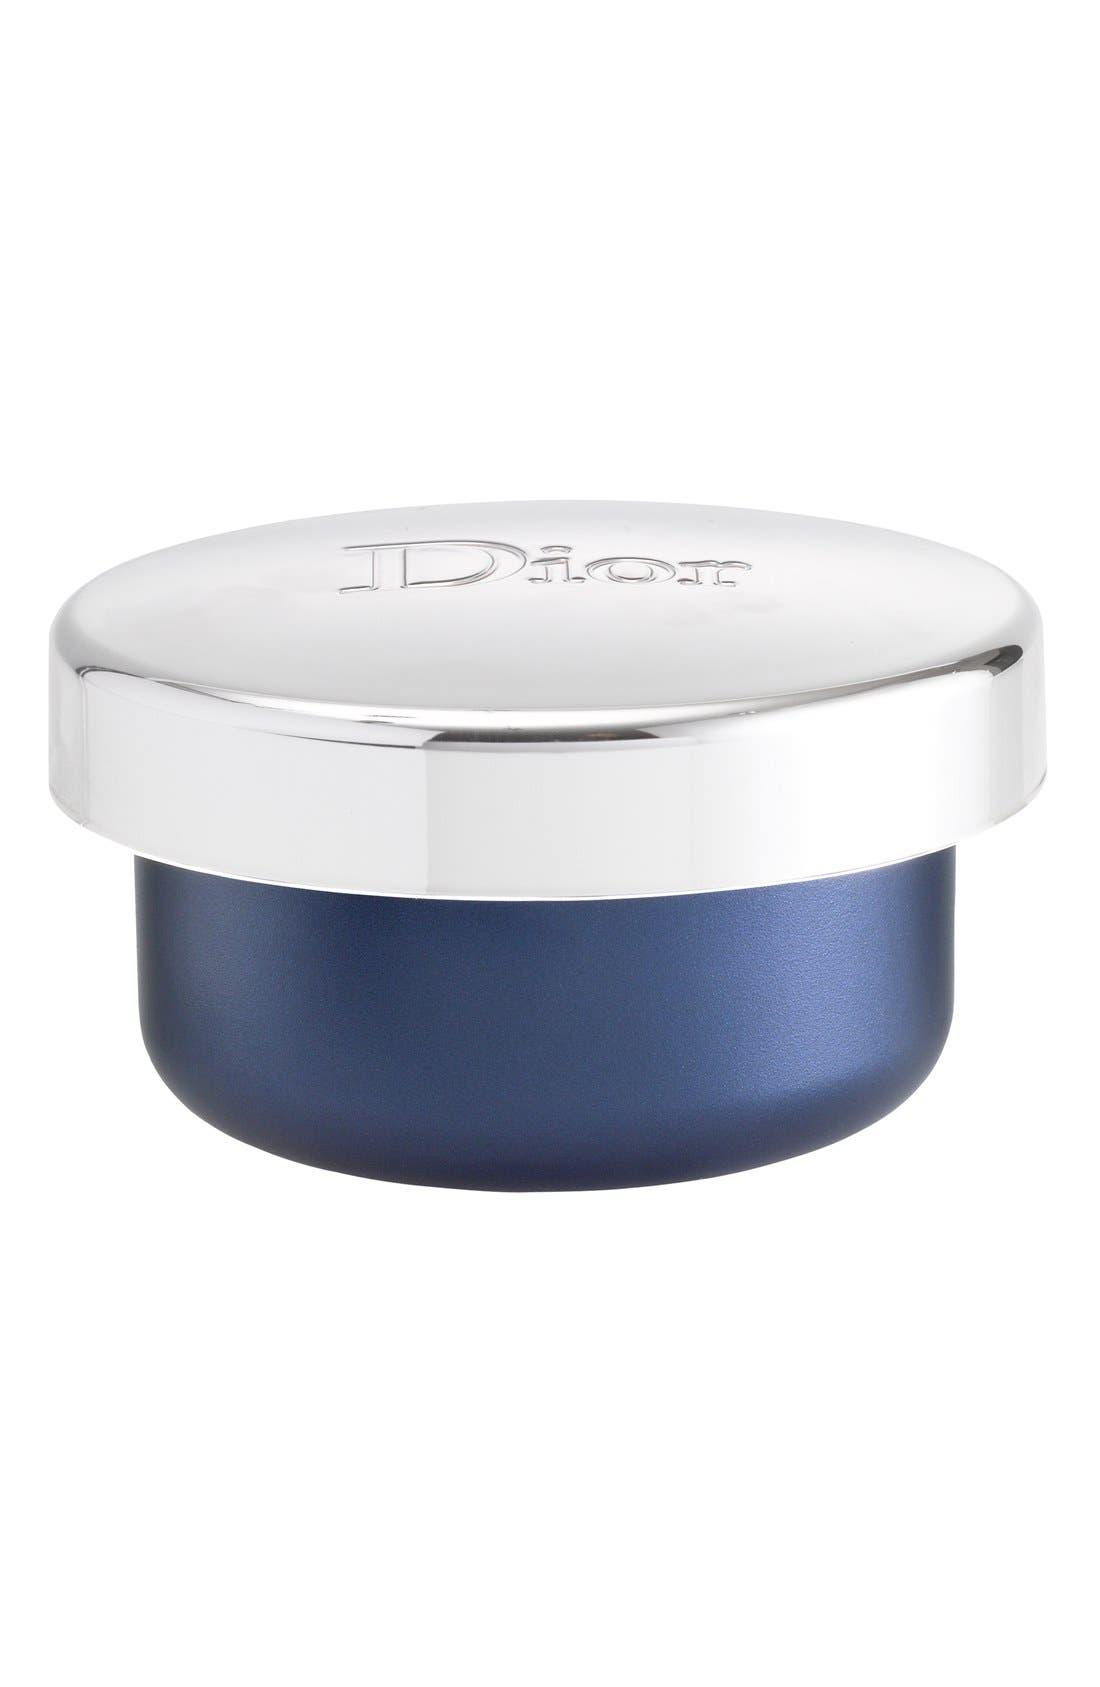 Capture Totale Intensive Restorative Night Crème for Face & Neck Refill,                         Main,                         color, NO COLOR